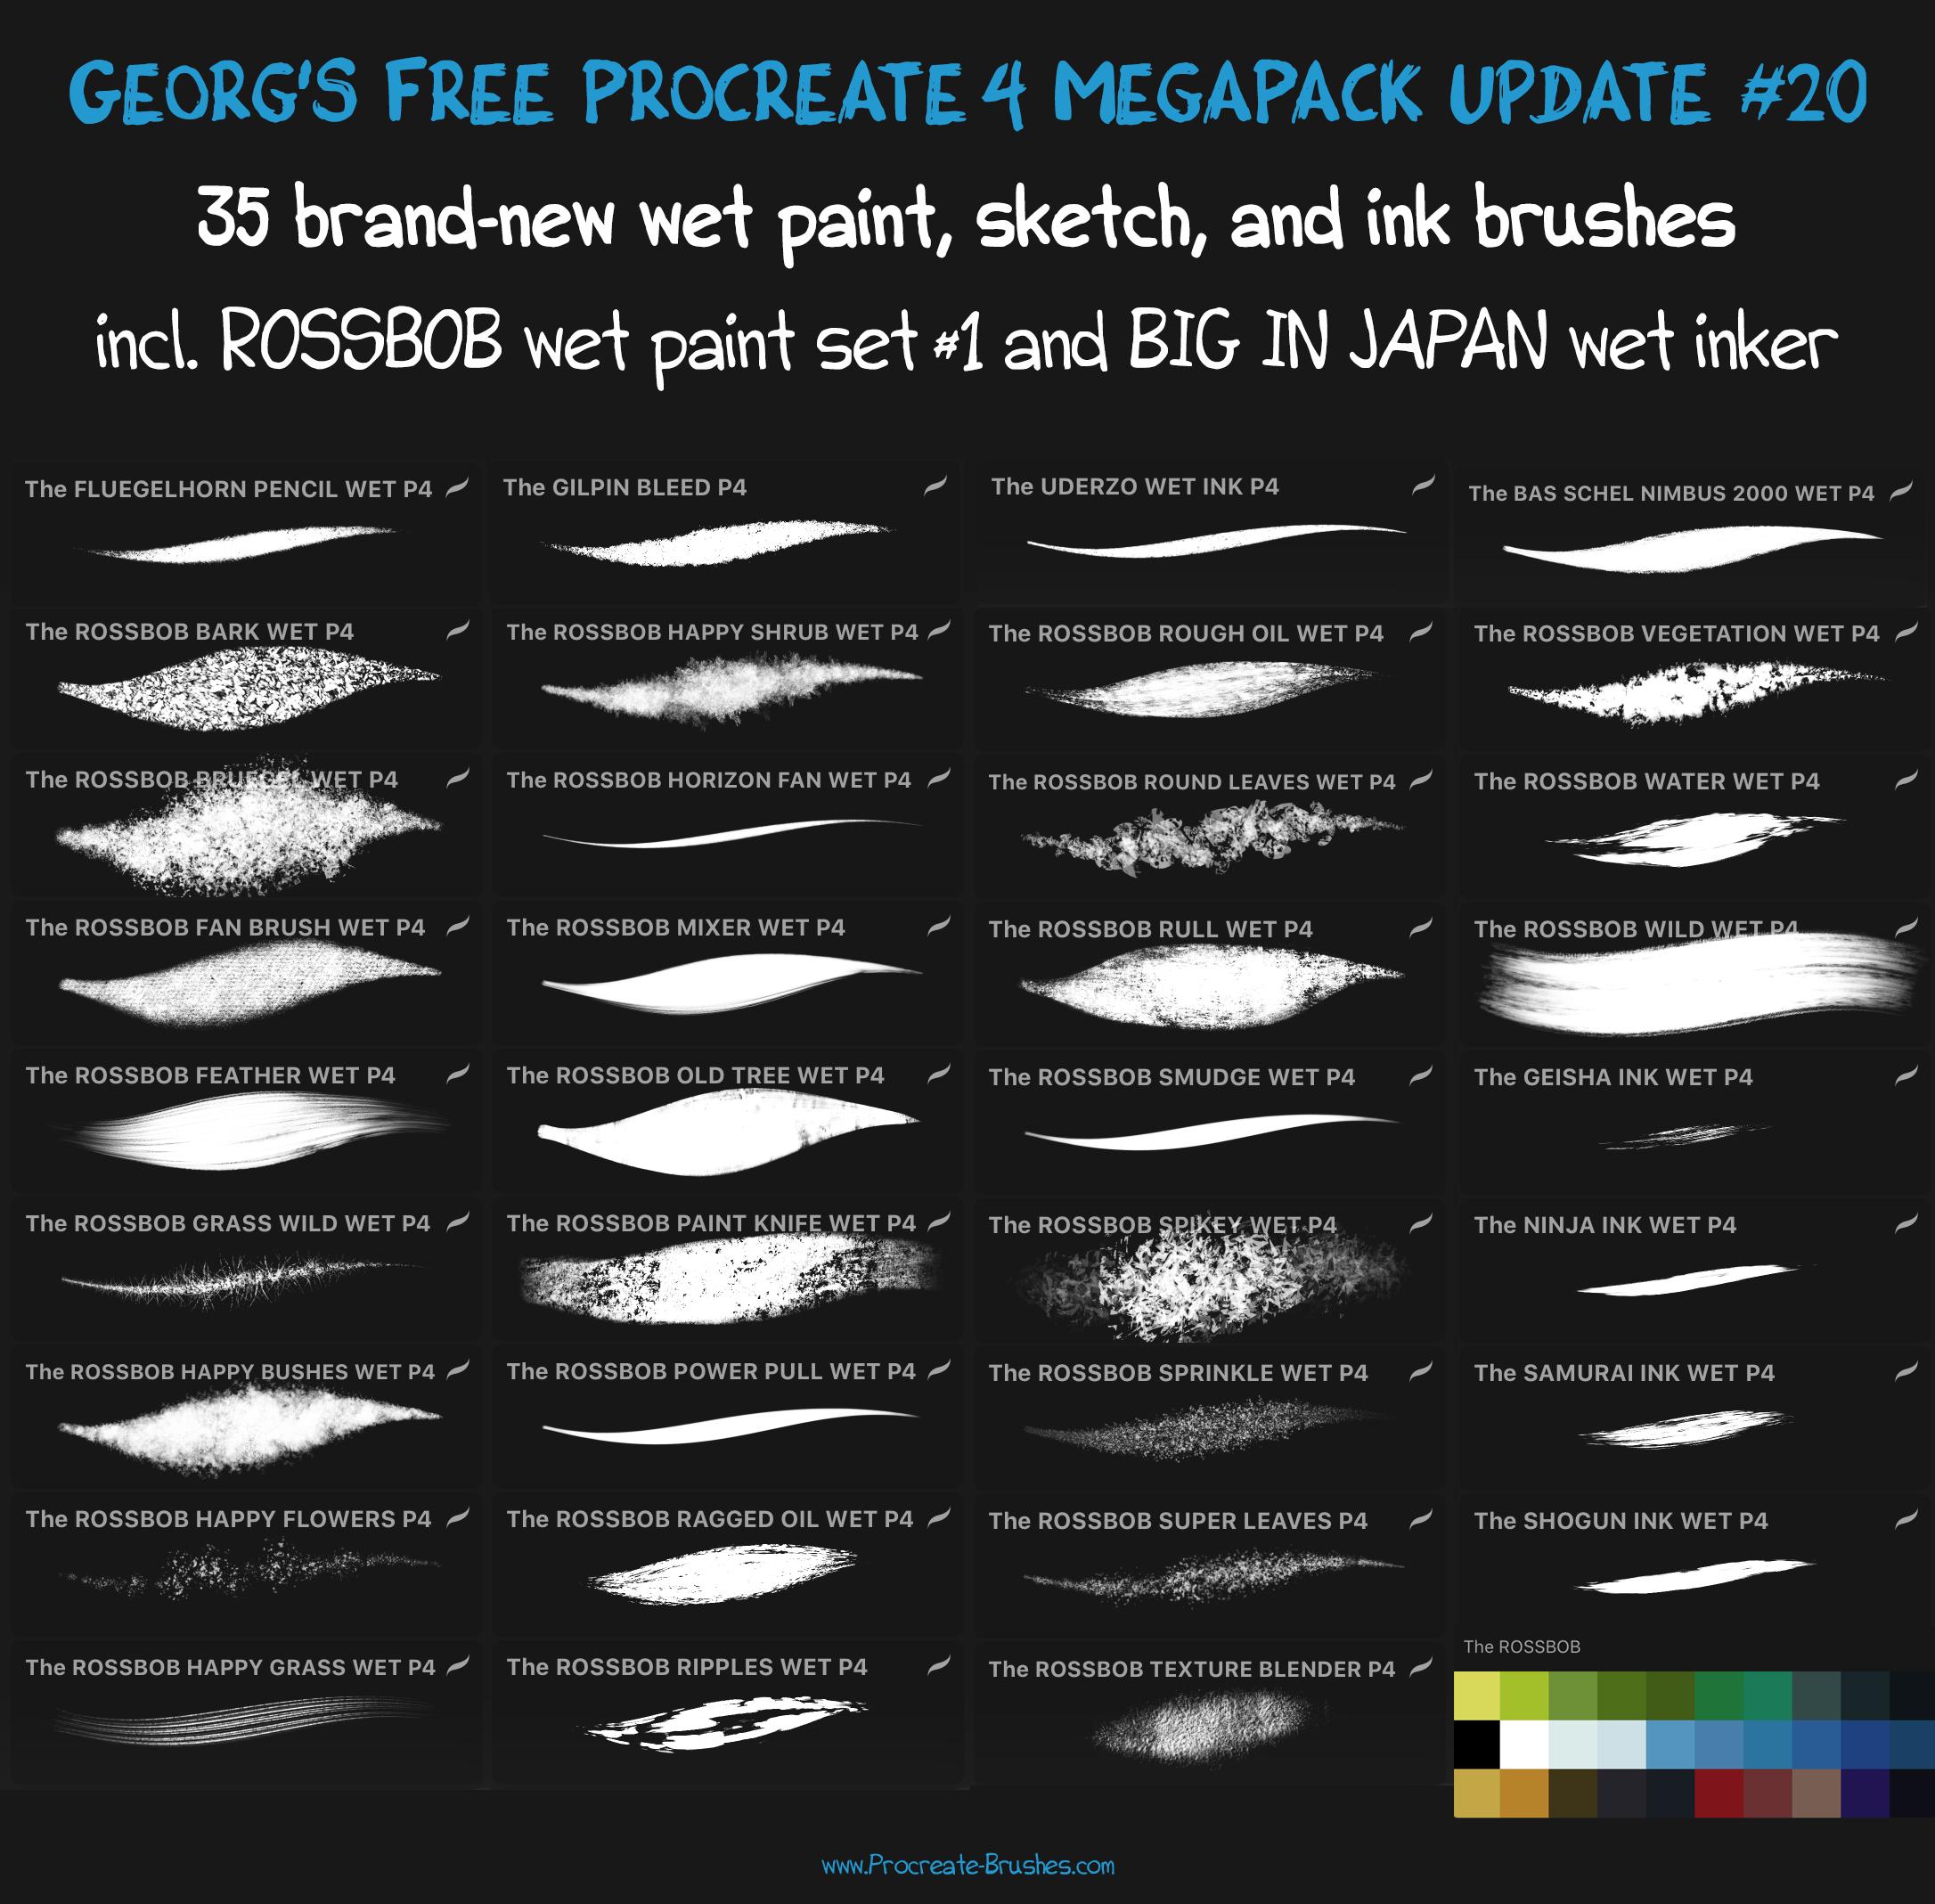 FREE Procreate 4 MegaPack Update #20 by georgvw on DeviantArt